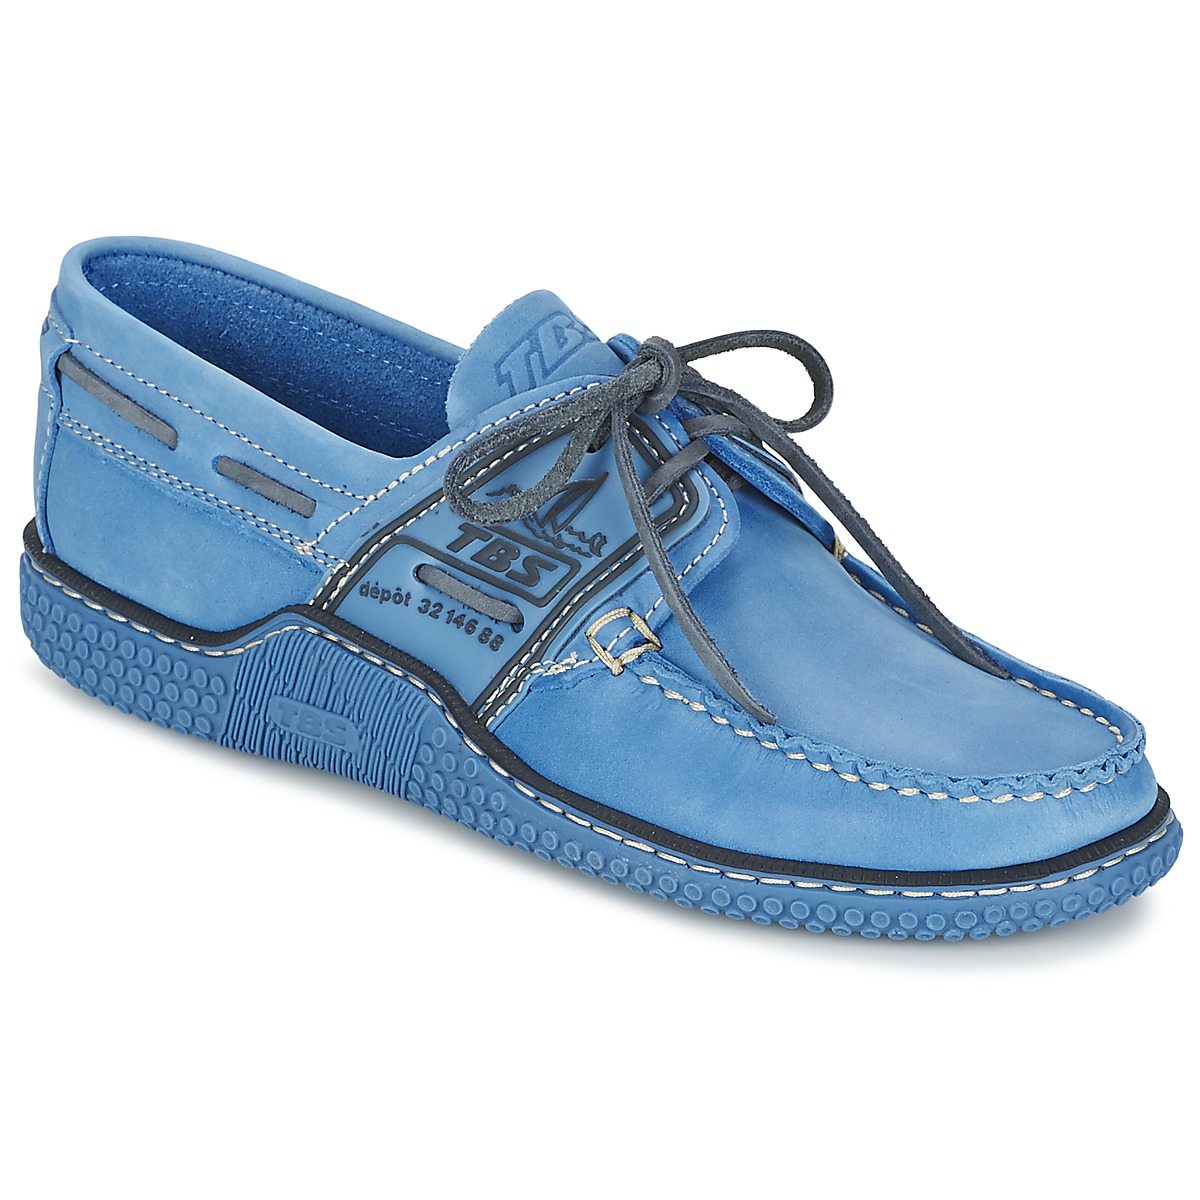 chaussures dockers footwear. Black Bedroom Furniture Sets. Home Design Ideas